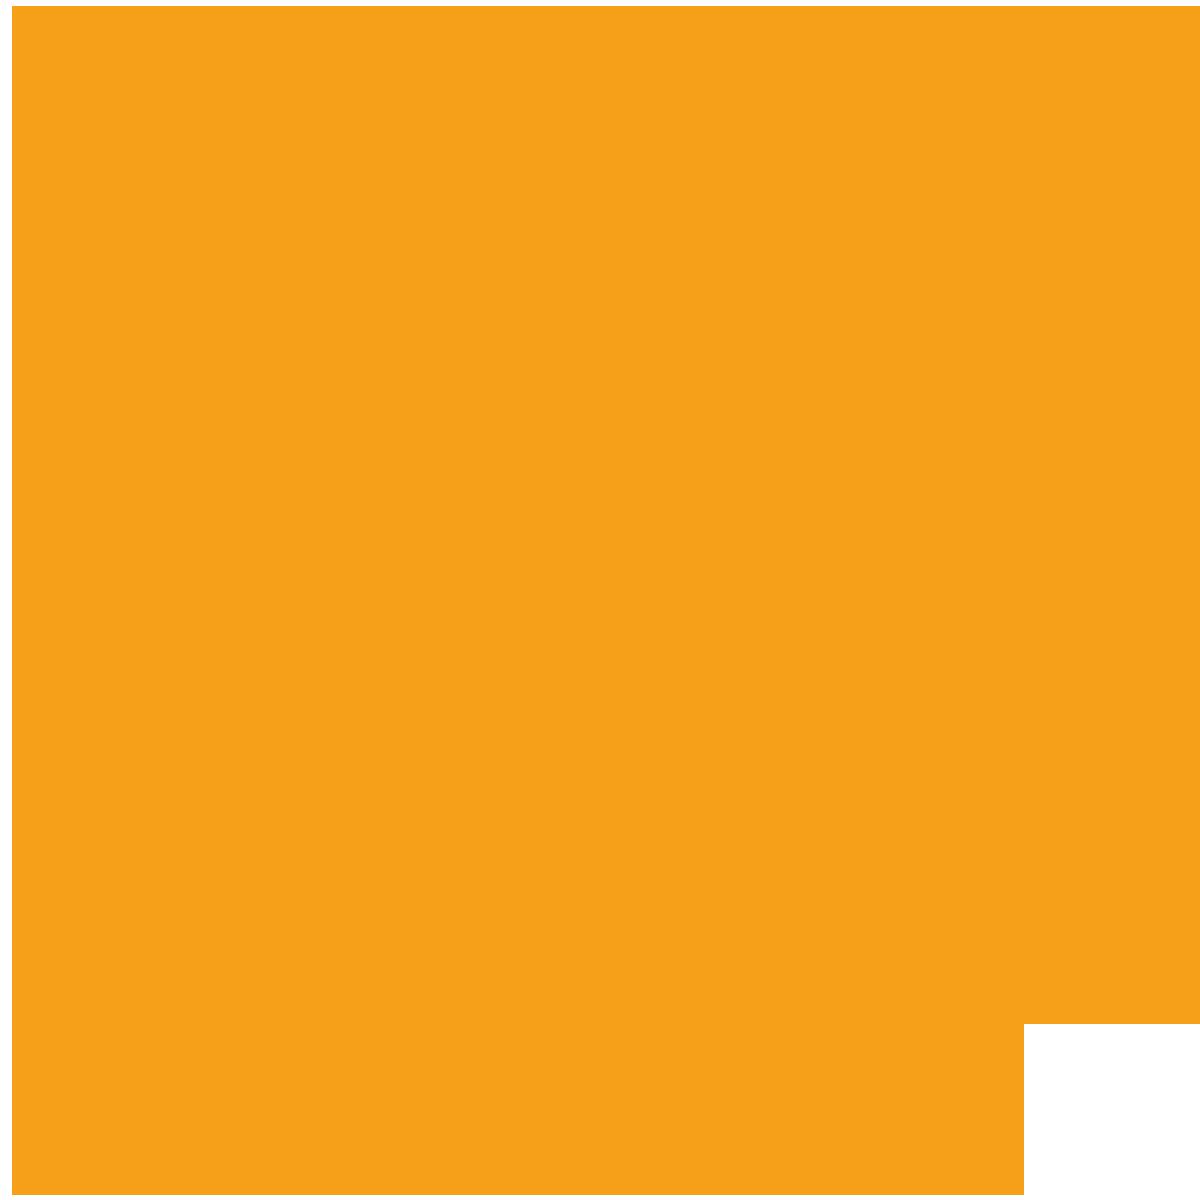 Soleil Orange Logo Wallpaper